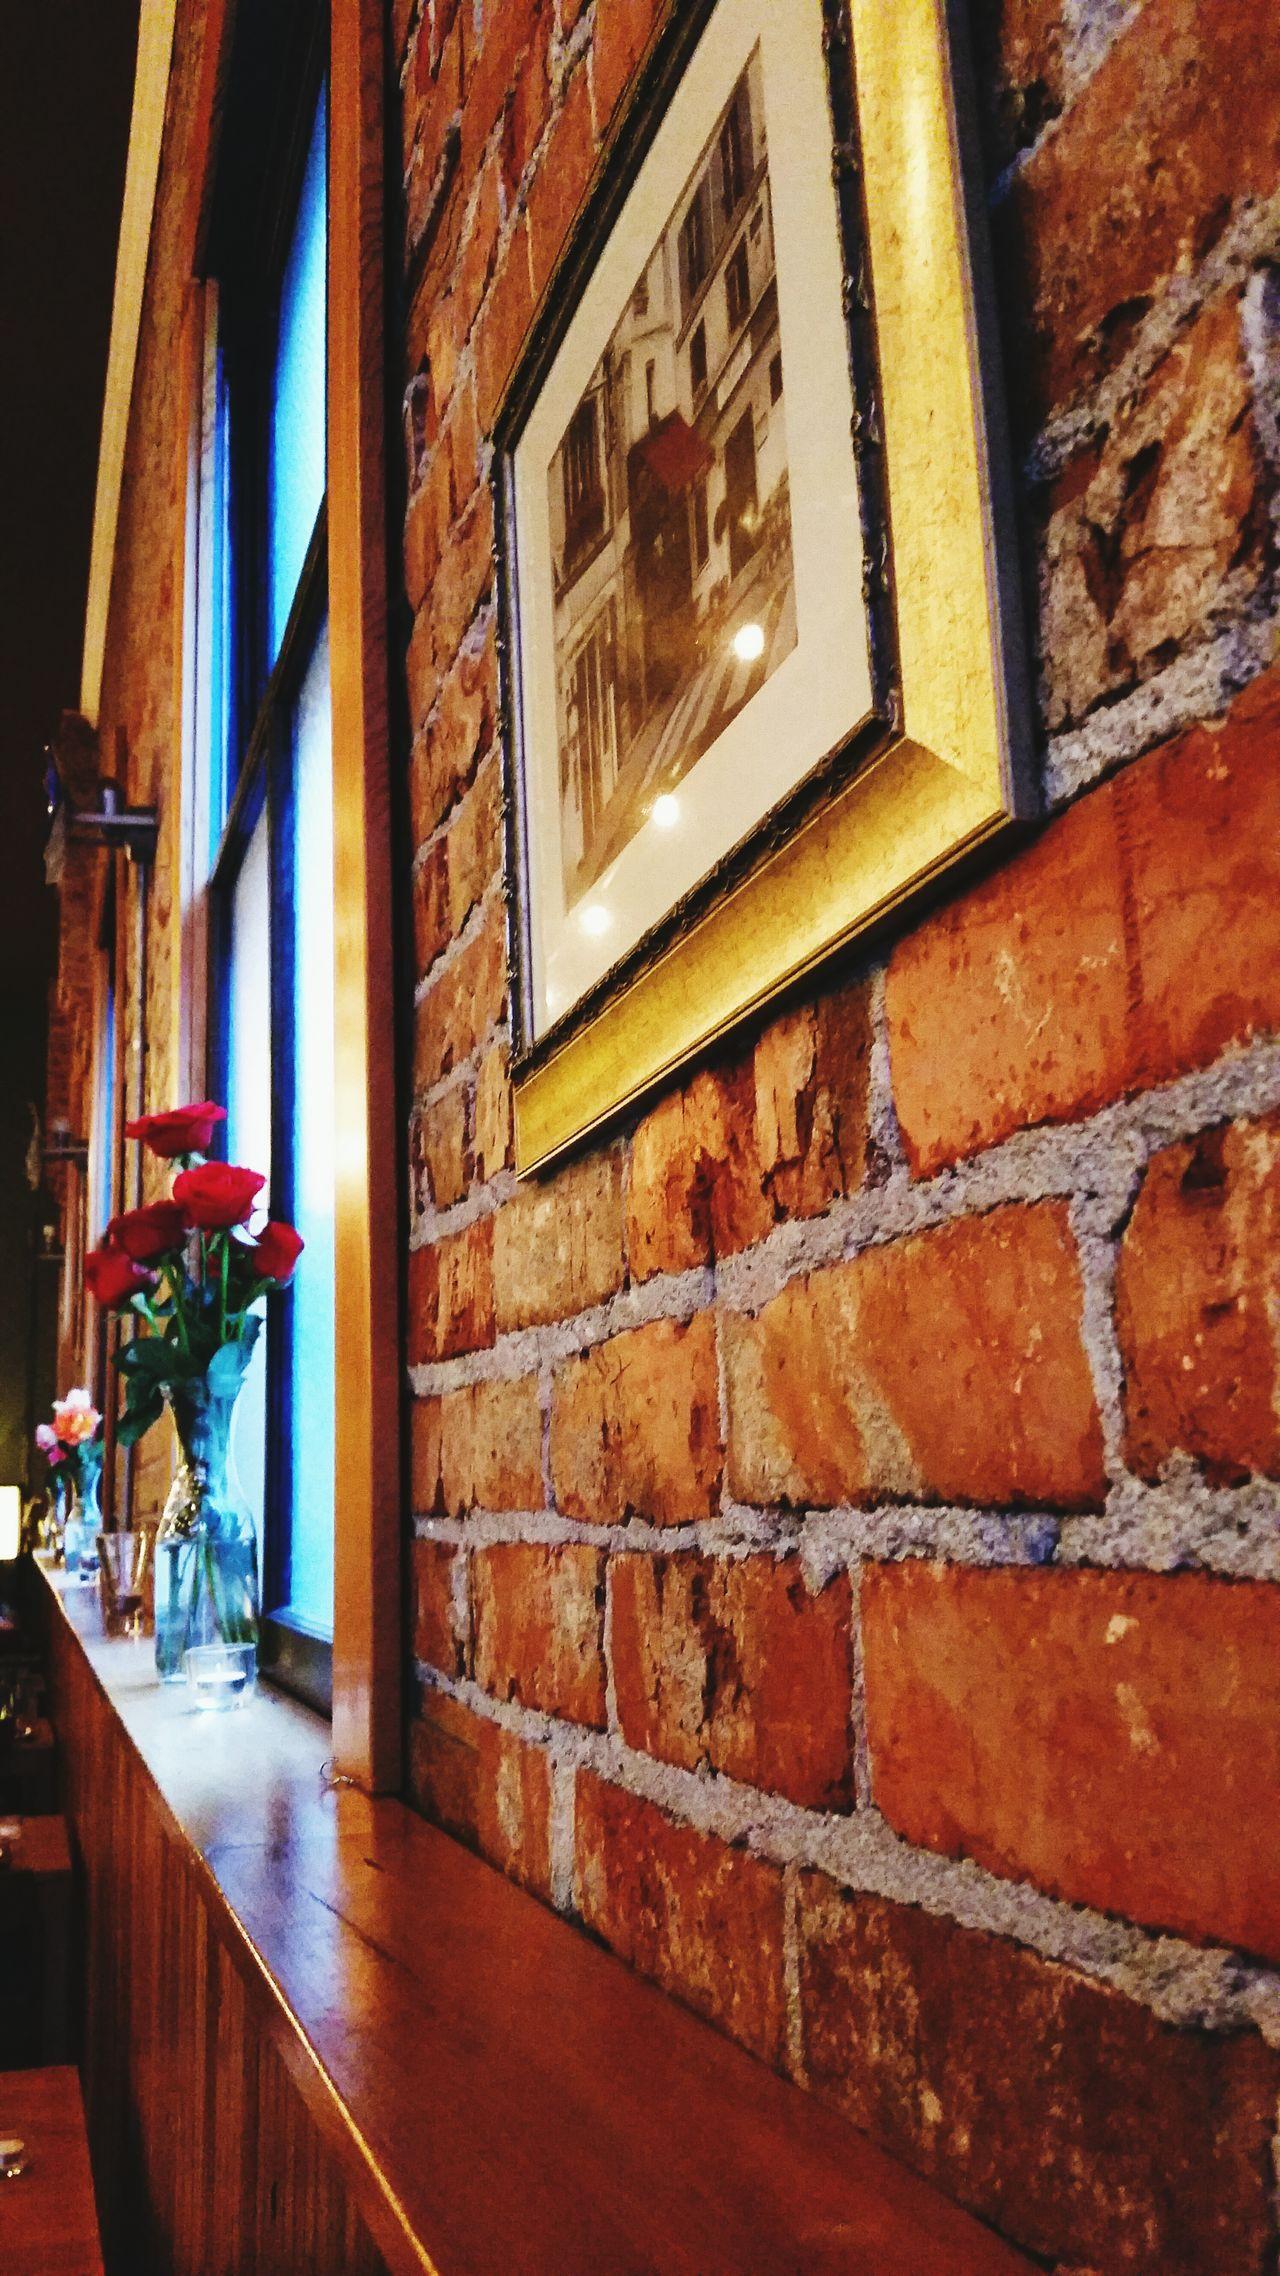 Roses on a rail Architecture Flower Roses Flowers  Restaurant Decor Restaurant Scene Bricks And Cement